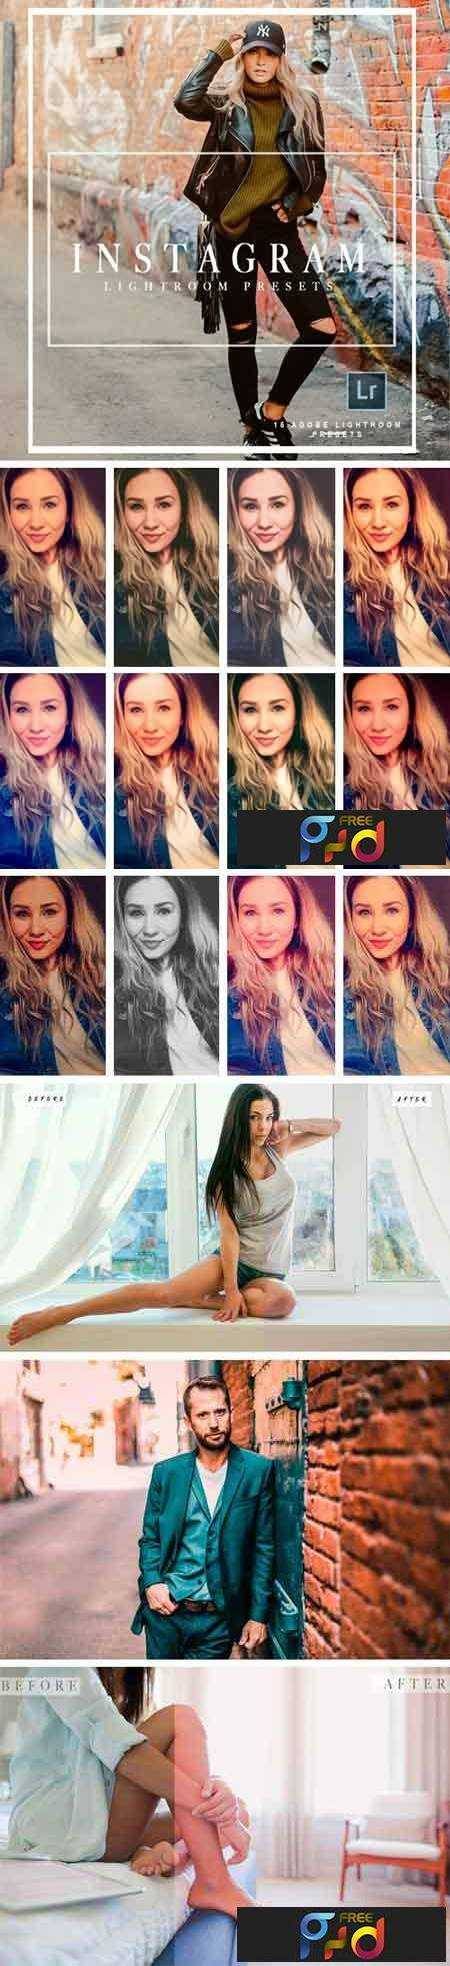 1709140 Instagram Lightroom Preset Bundle 2100927 1